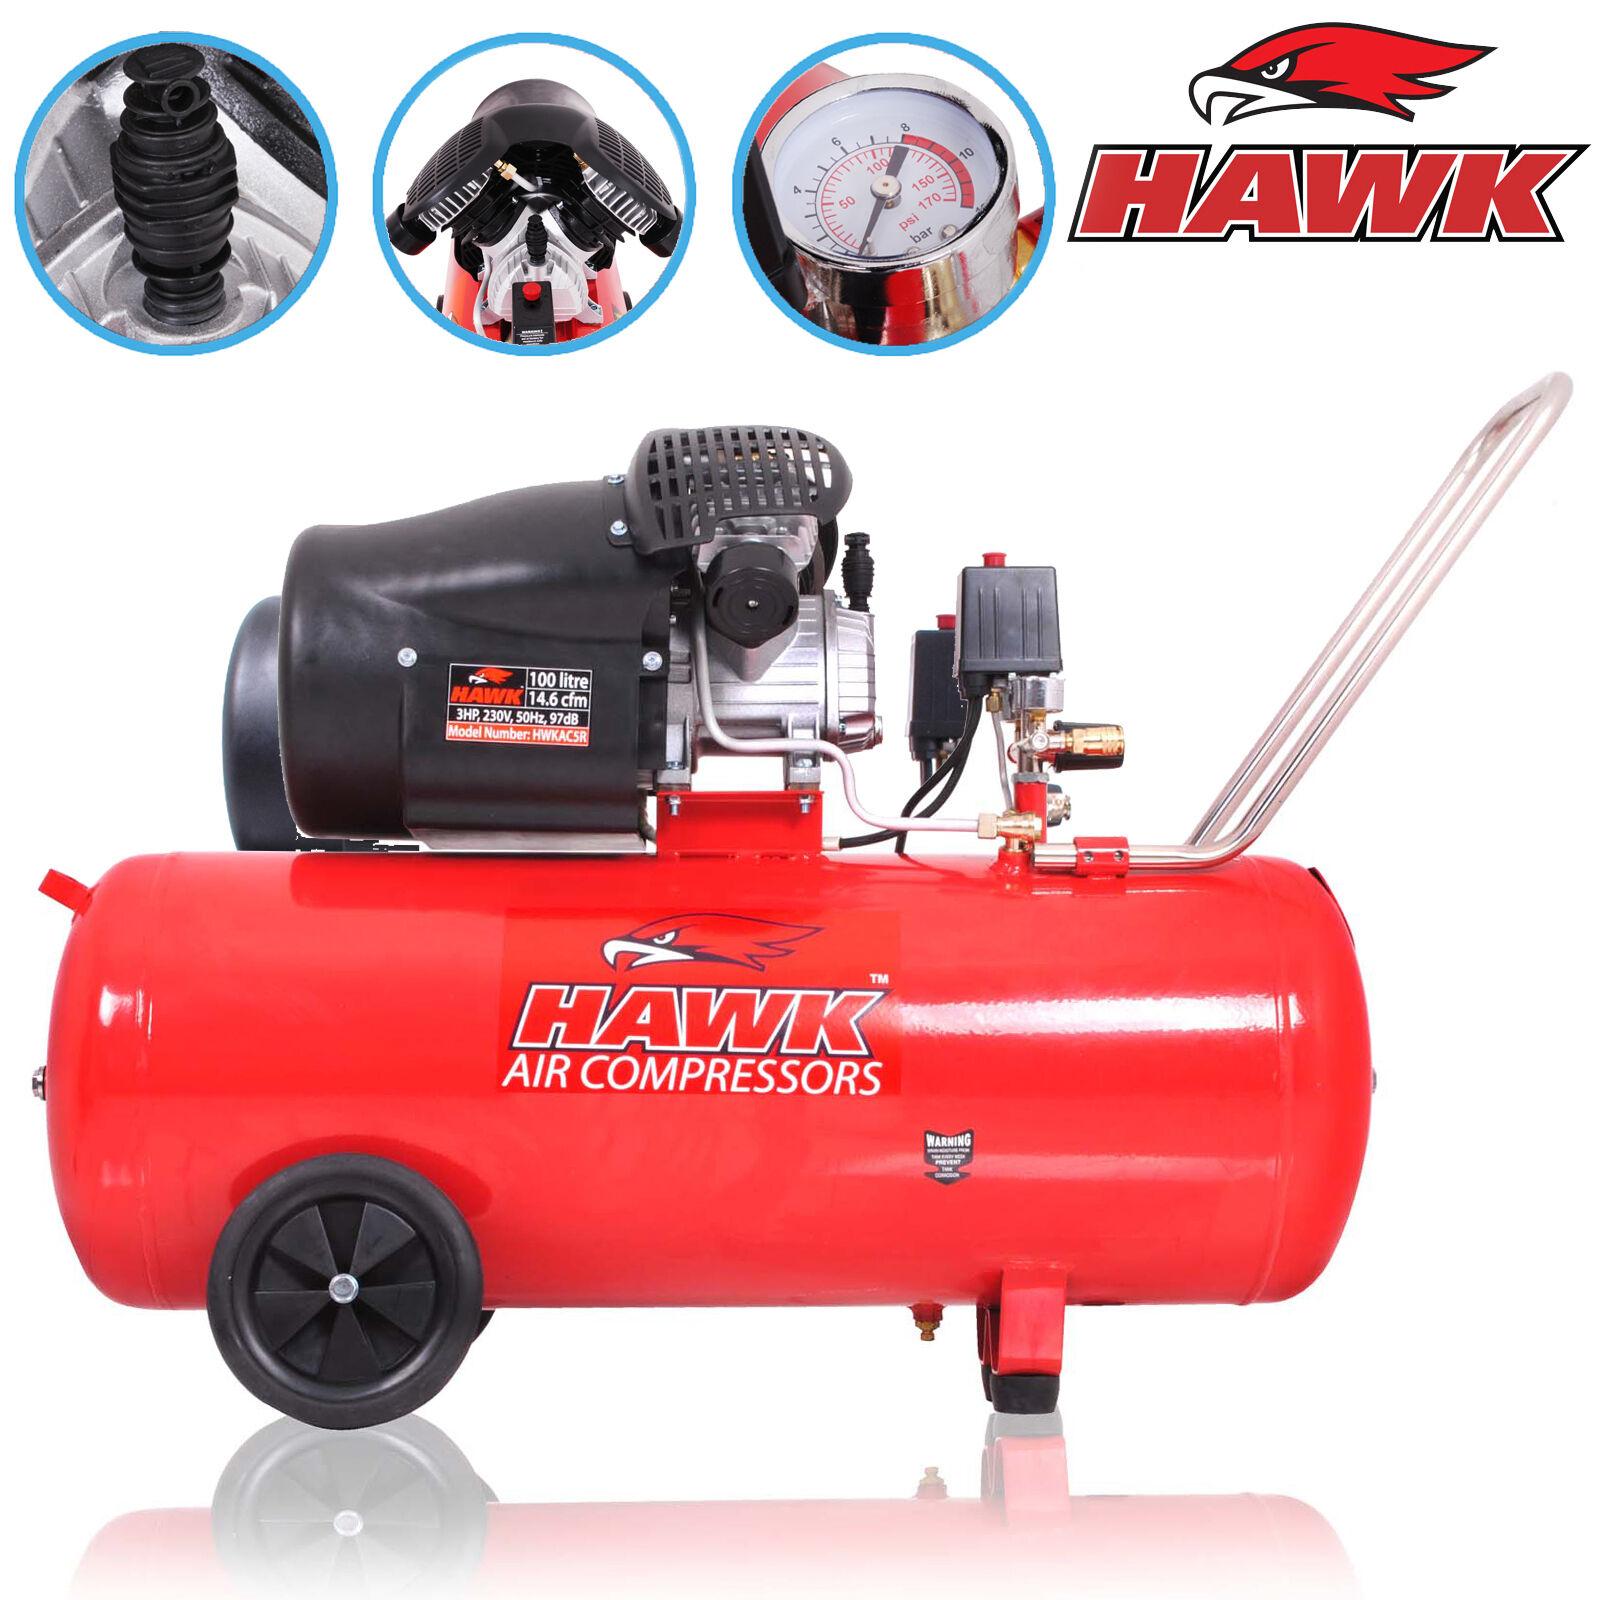 HAWK TOOLS 100l 3HP 14.6cfm TWIN V ENGINE 8 BAR GARAGE